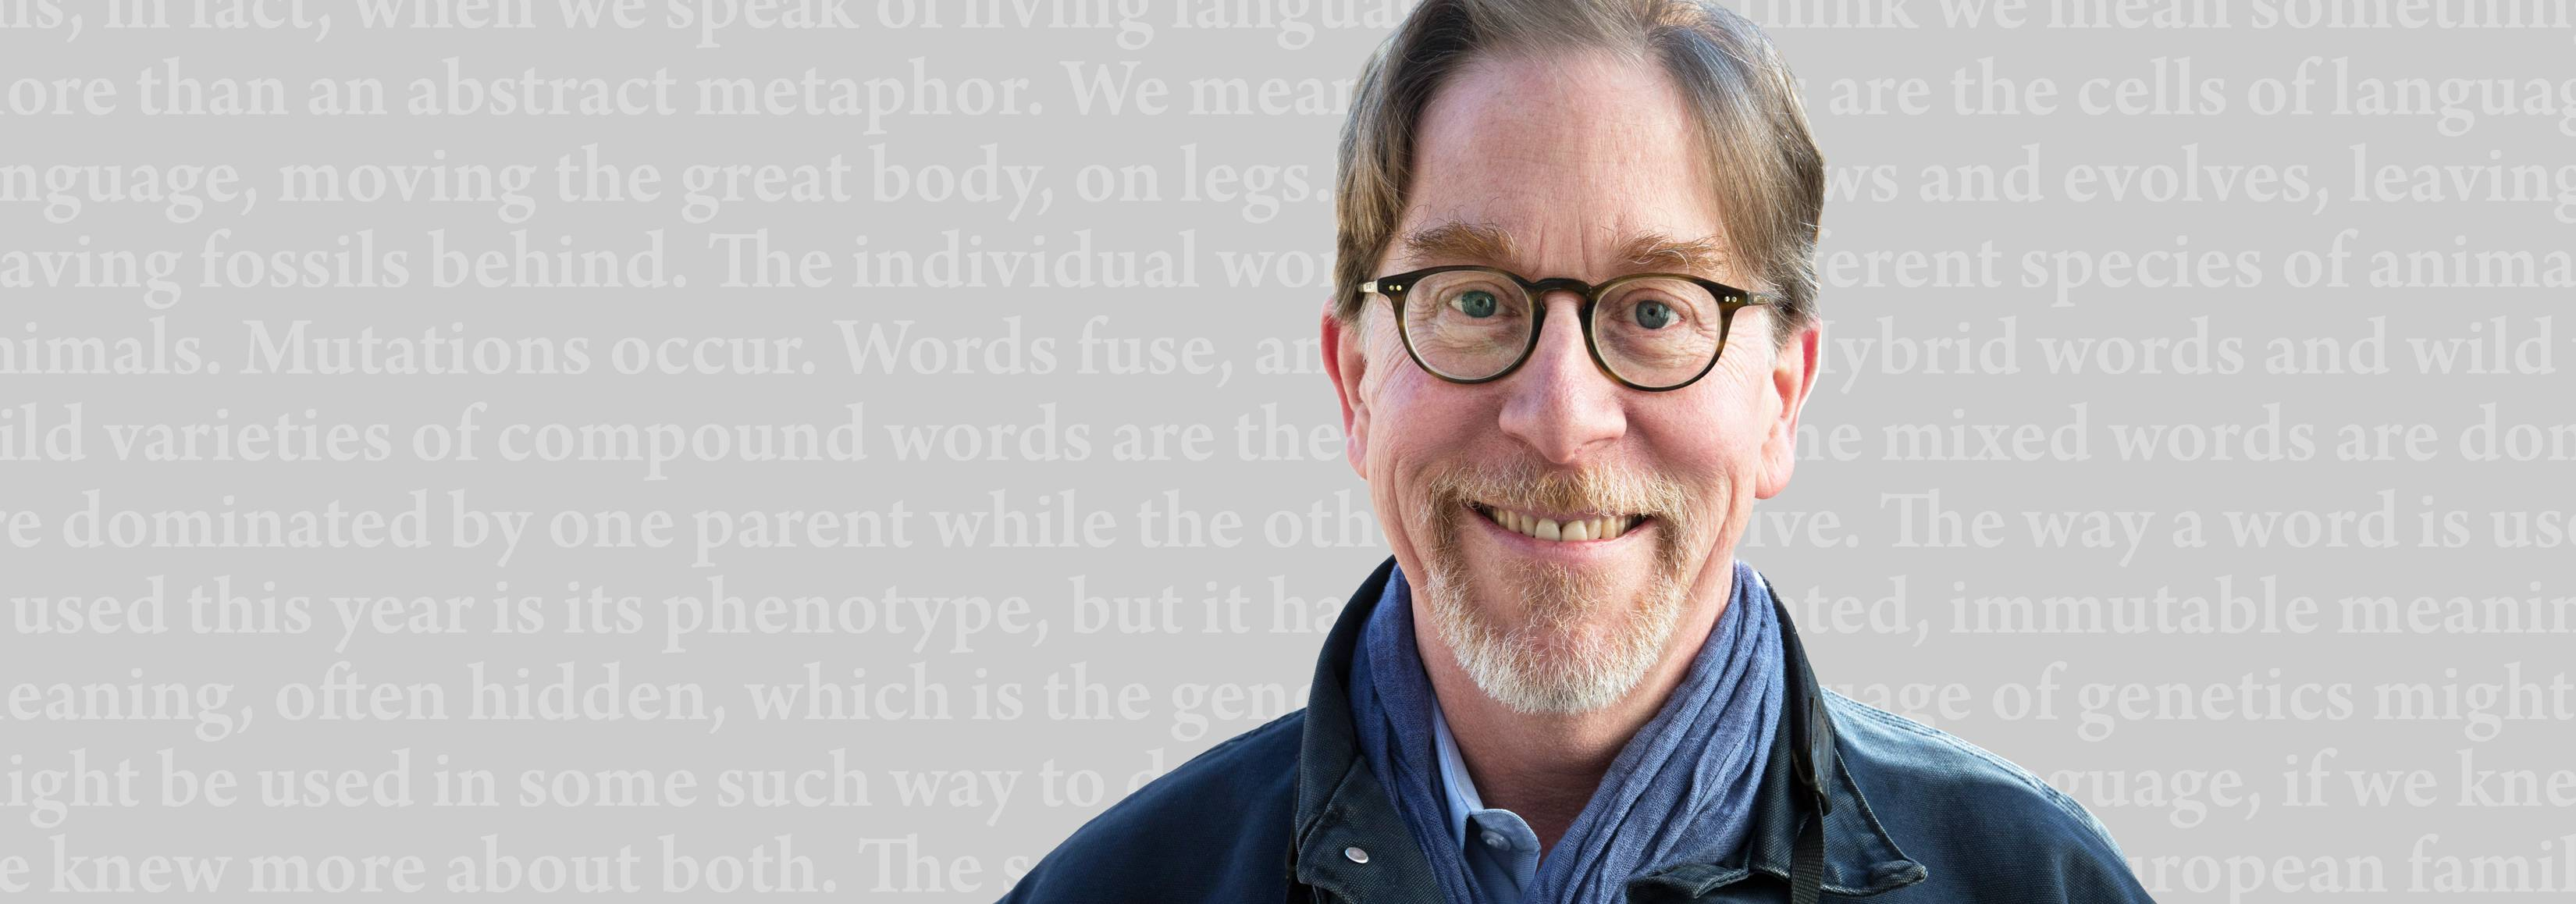 Richard O. Prum, Ph.D.